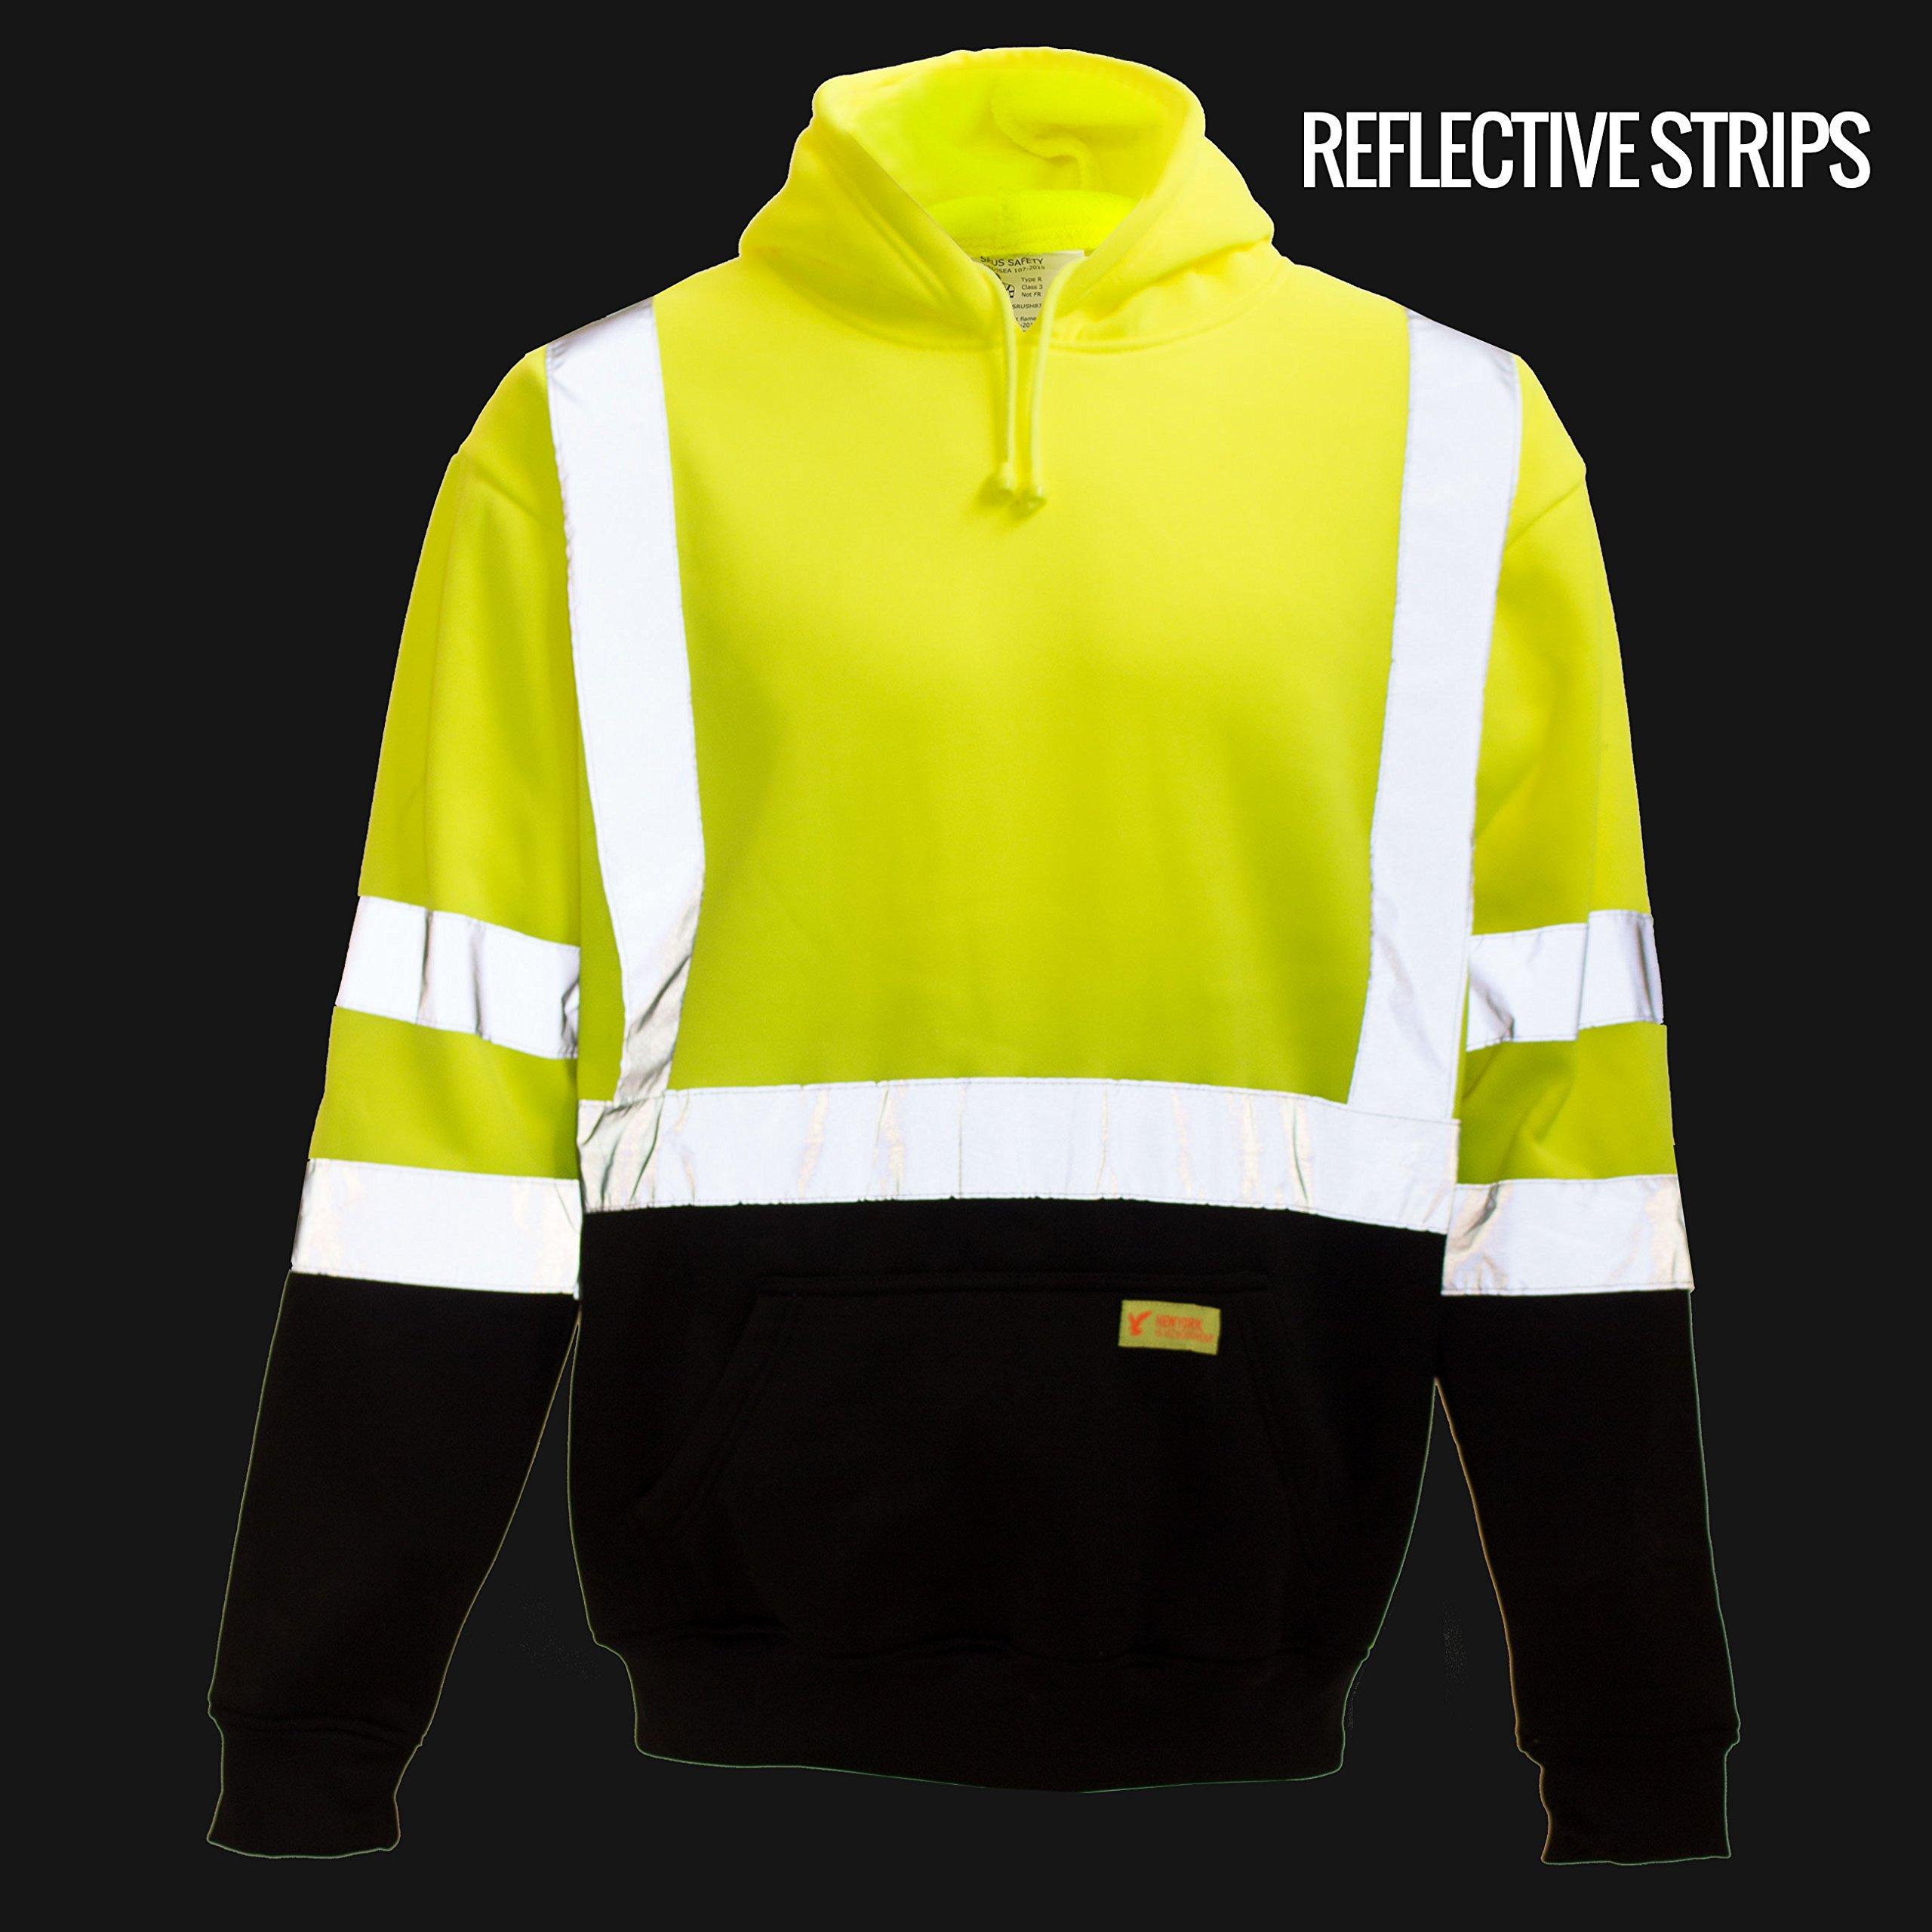 New York Hi-Viz Workwear H8312 Men's ANSI Class 3 High Visibility Class 3 Sweatshirt, Hooded Pullover, Knit Lining, Black Bottom (Lime, Large) by New York Hi-Viz Workwear (Image #4)